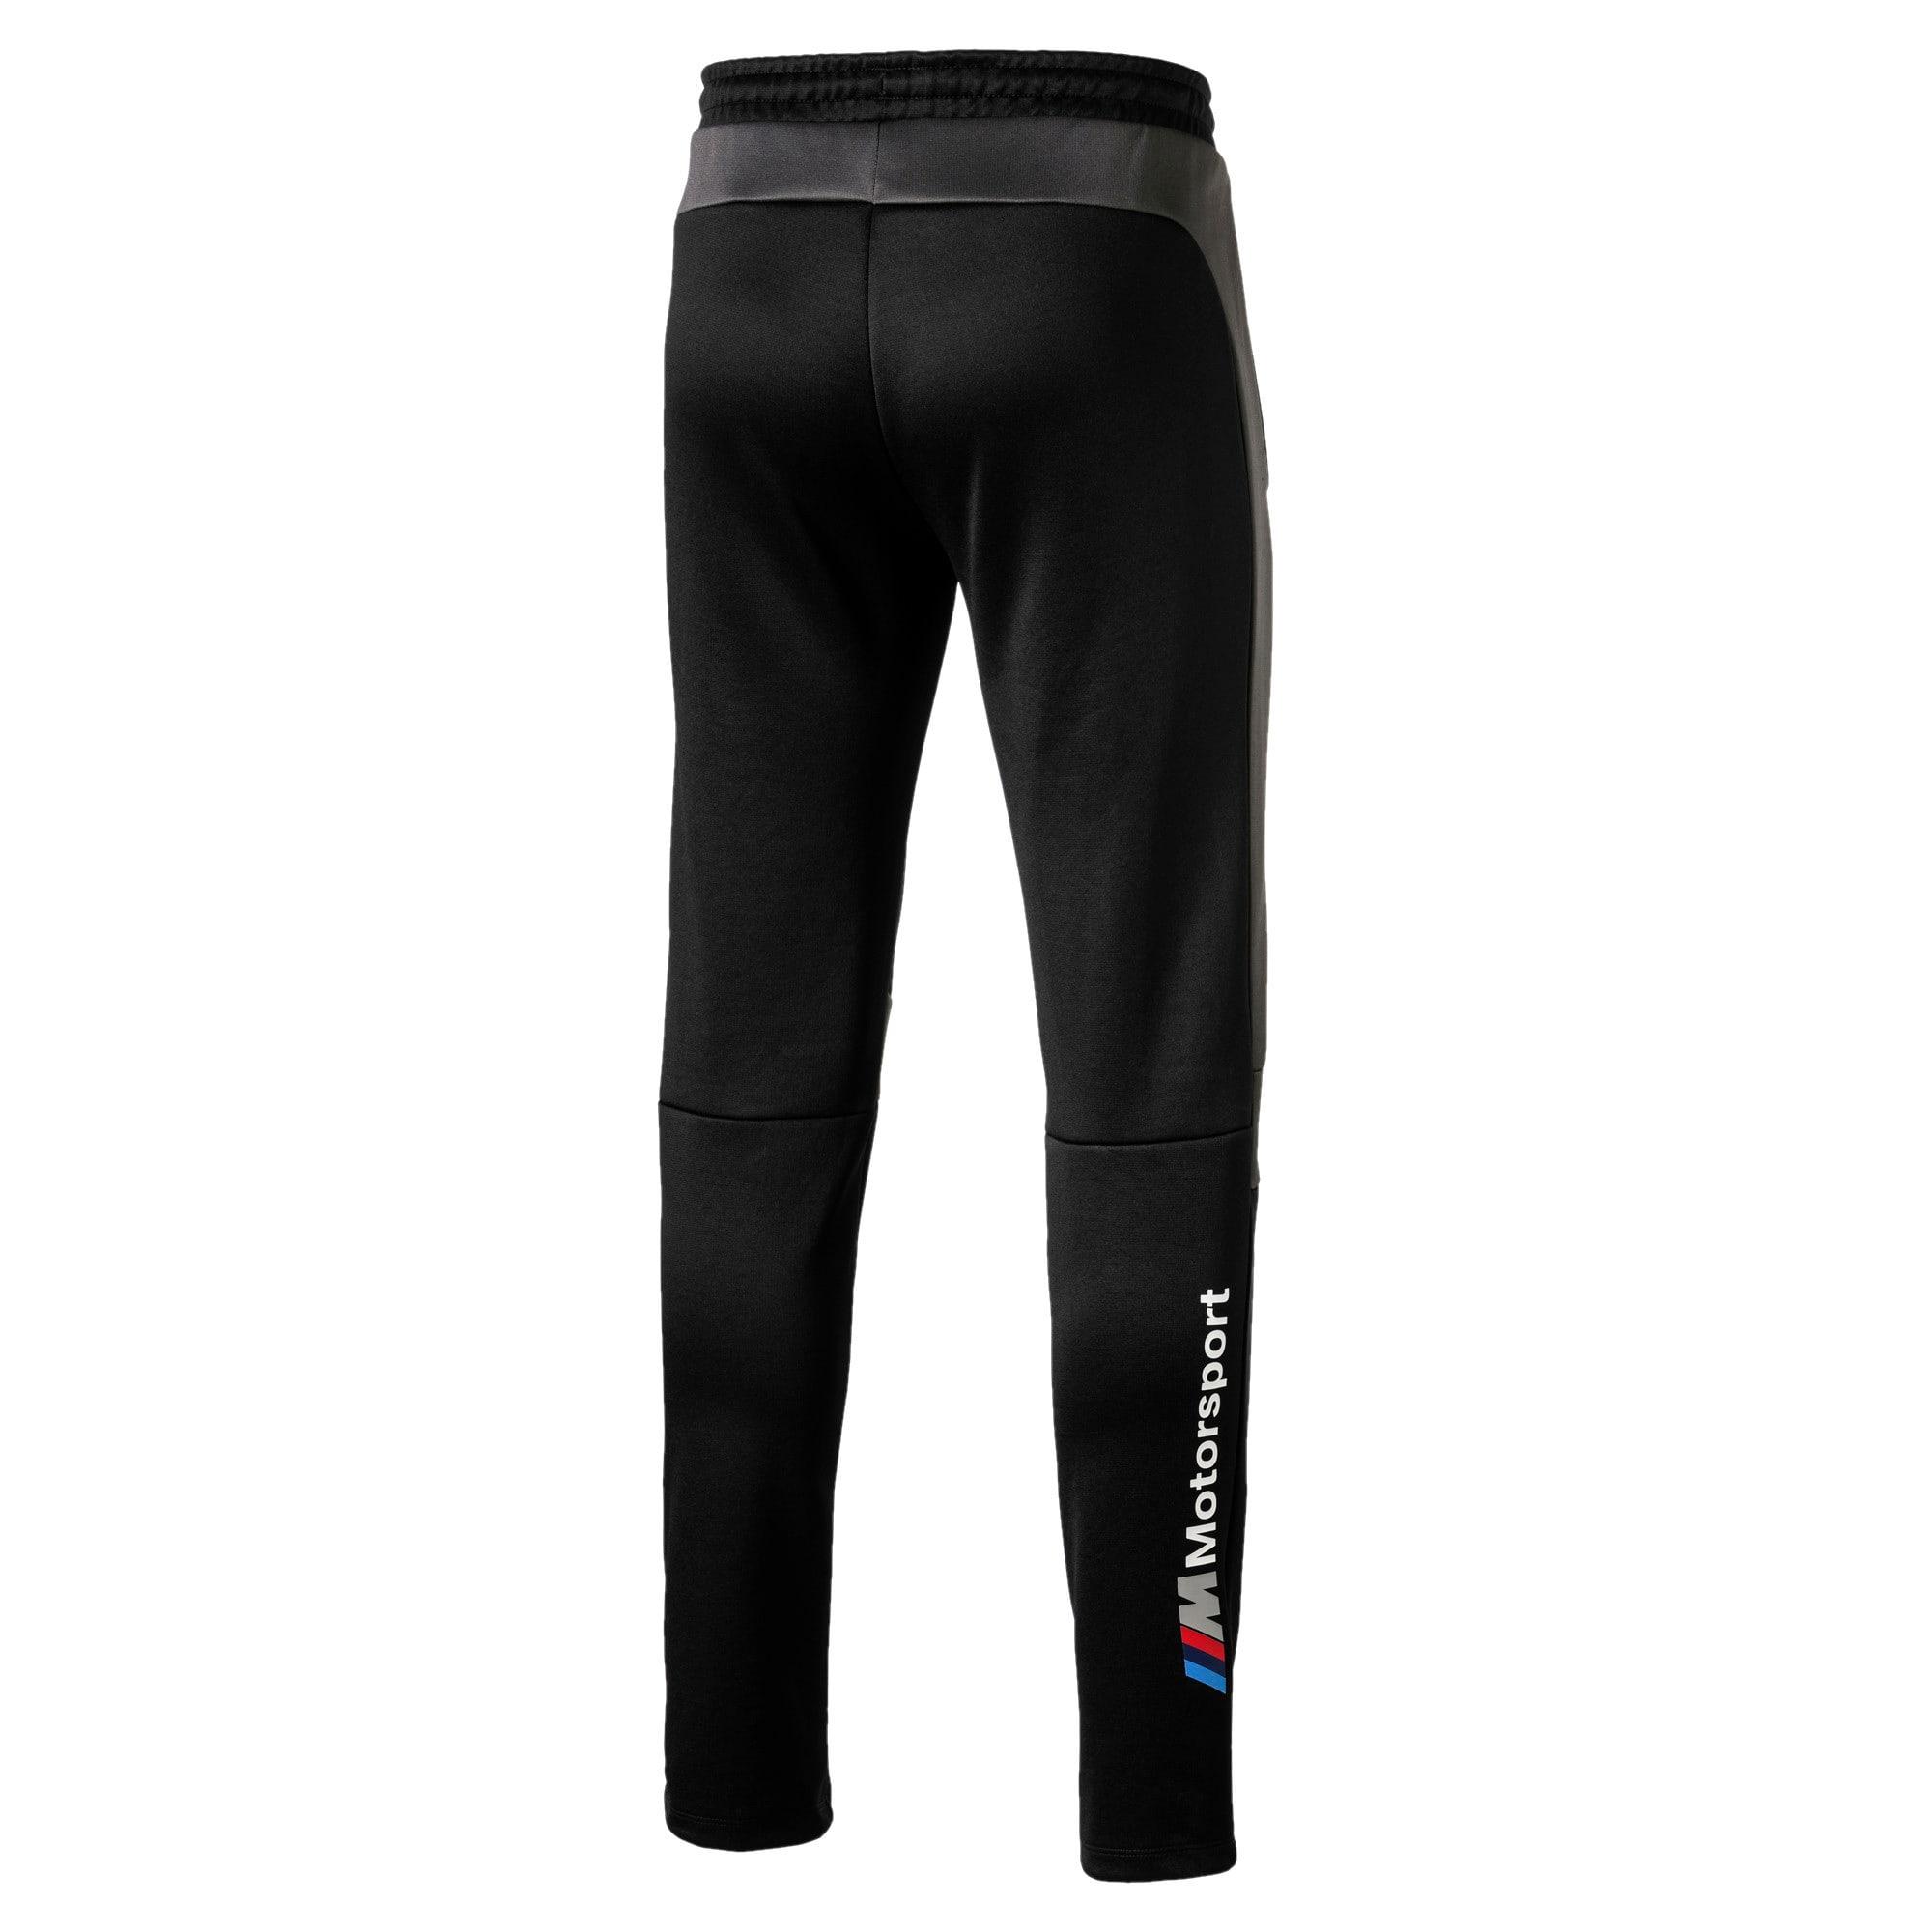 Miniatura 3 de Pantalones deportivos BMW M Motorsport T7 para hombre, Puma Black, mediano